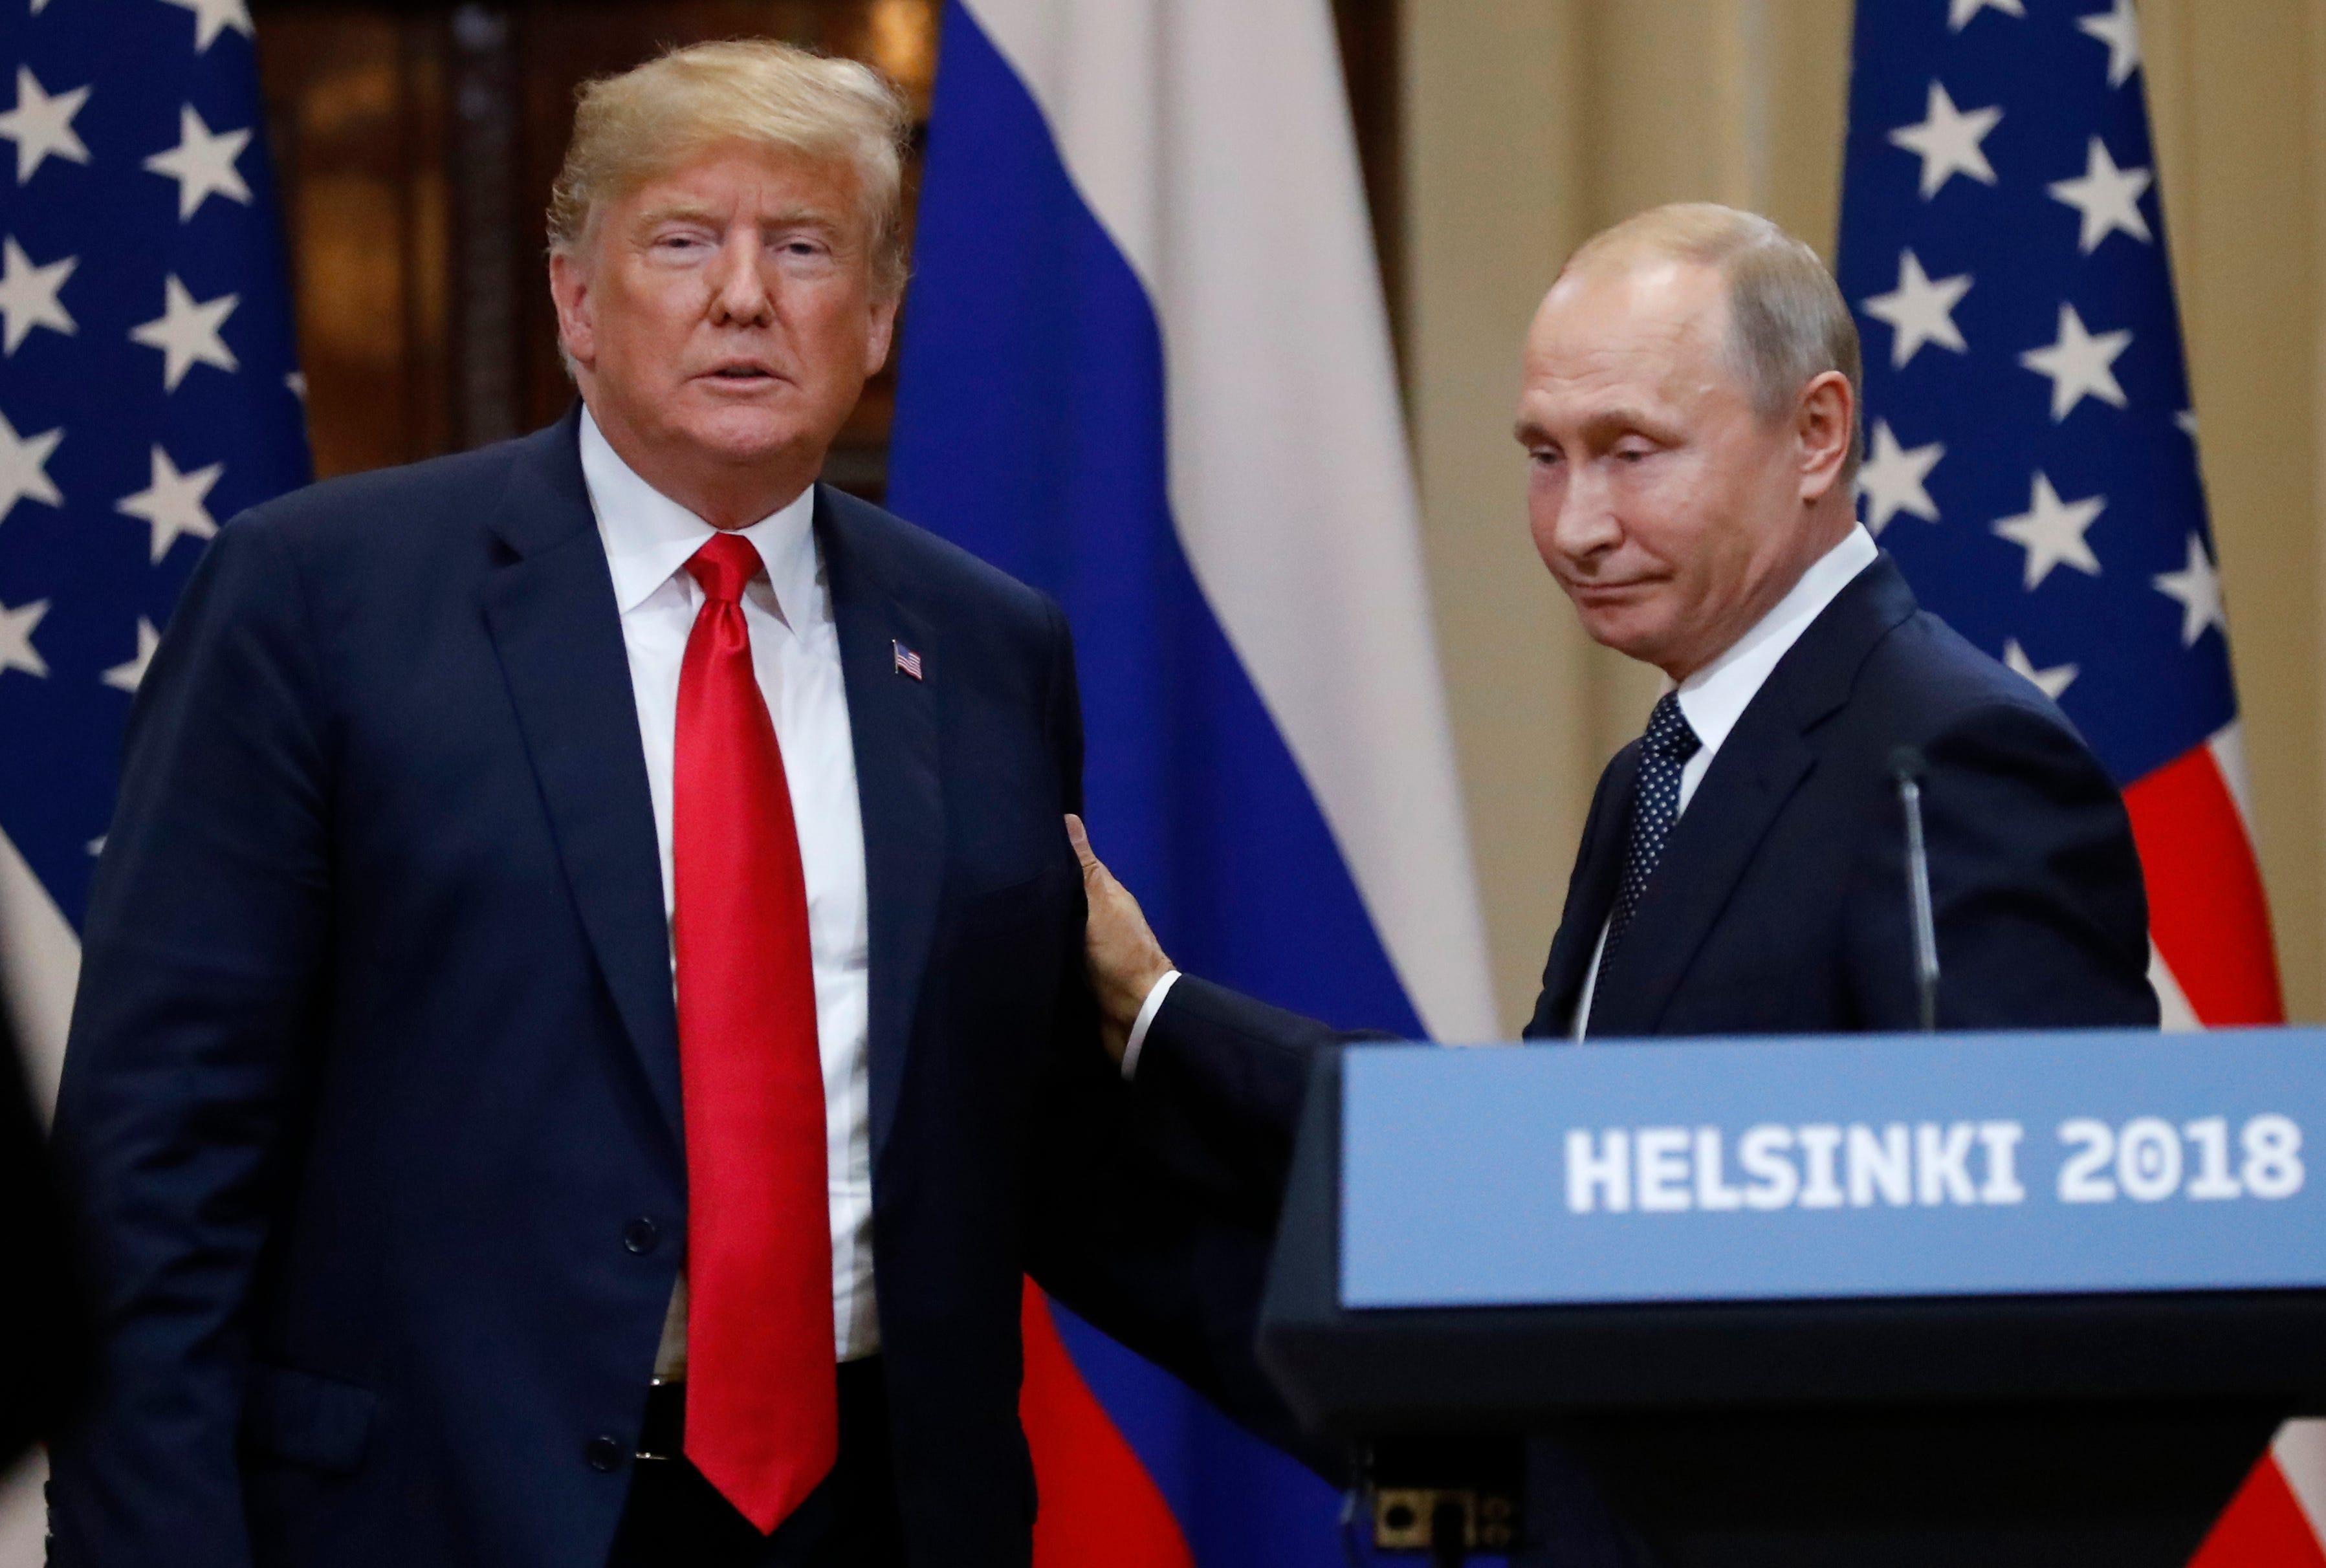 President Trump struggles to contain firestorm over Putin summit